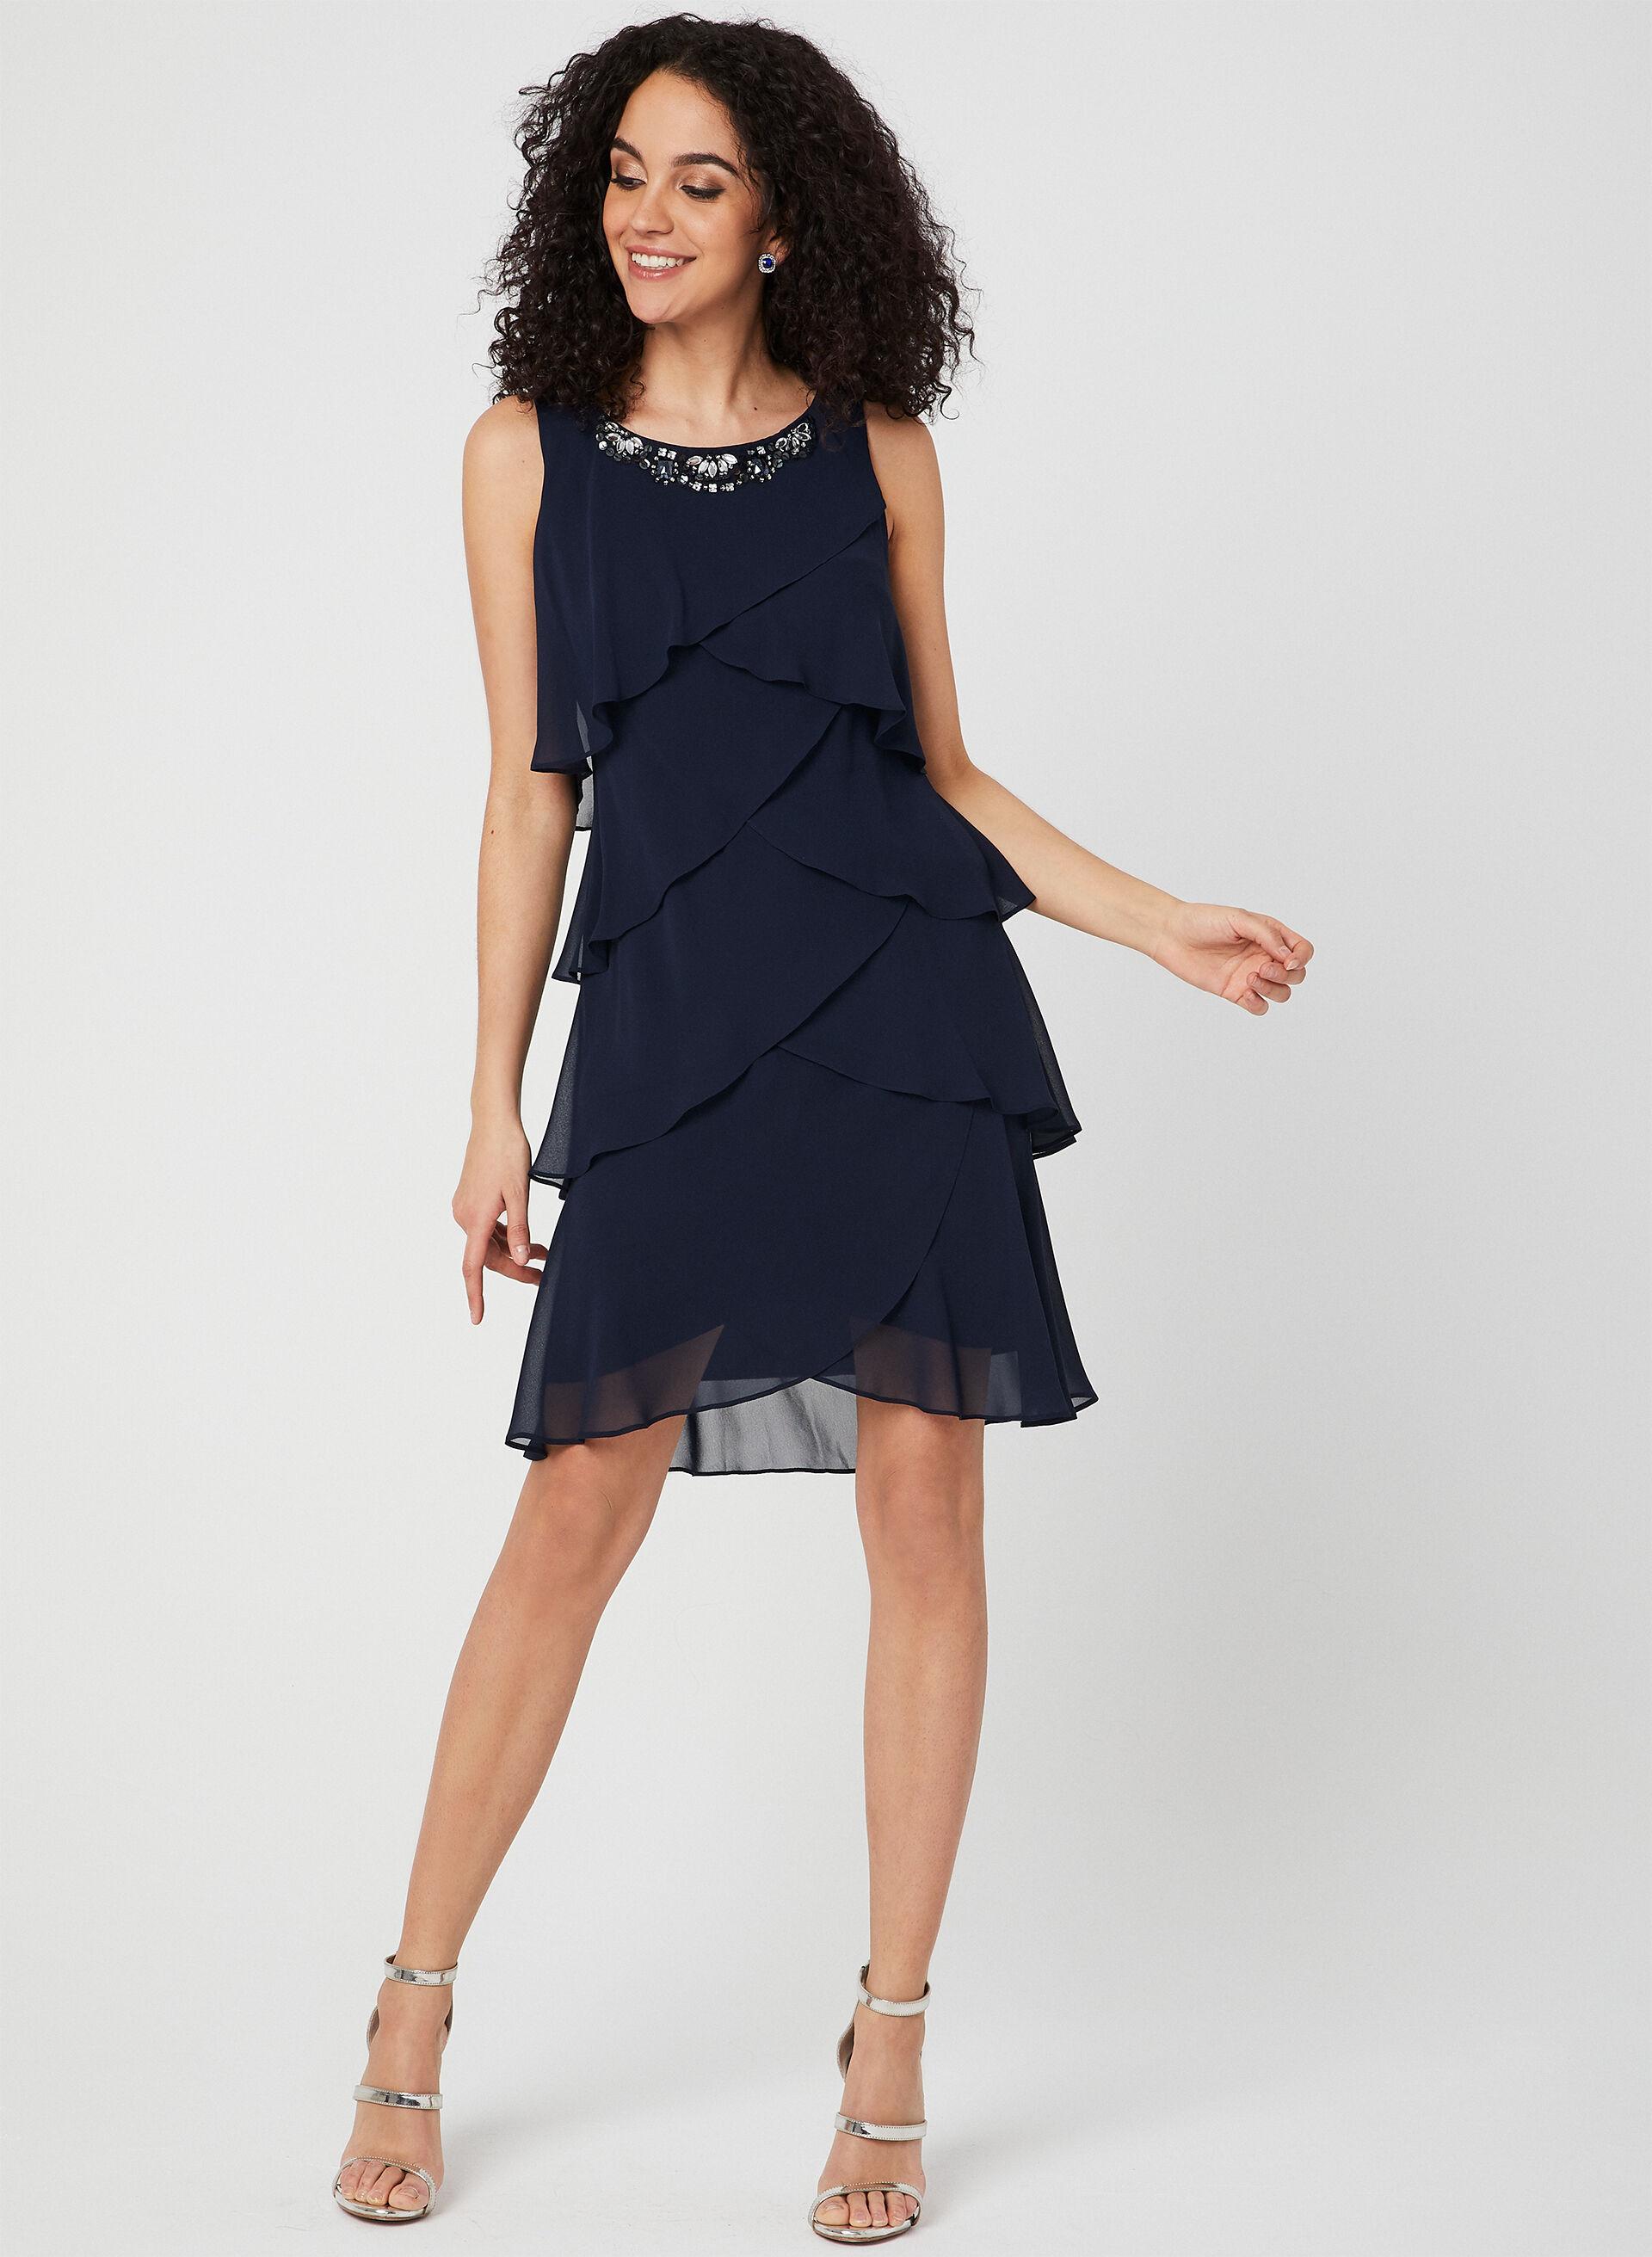 Marshalls Evening Dresses